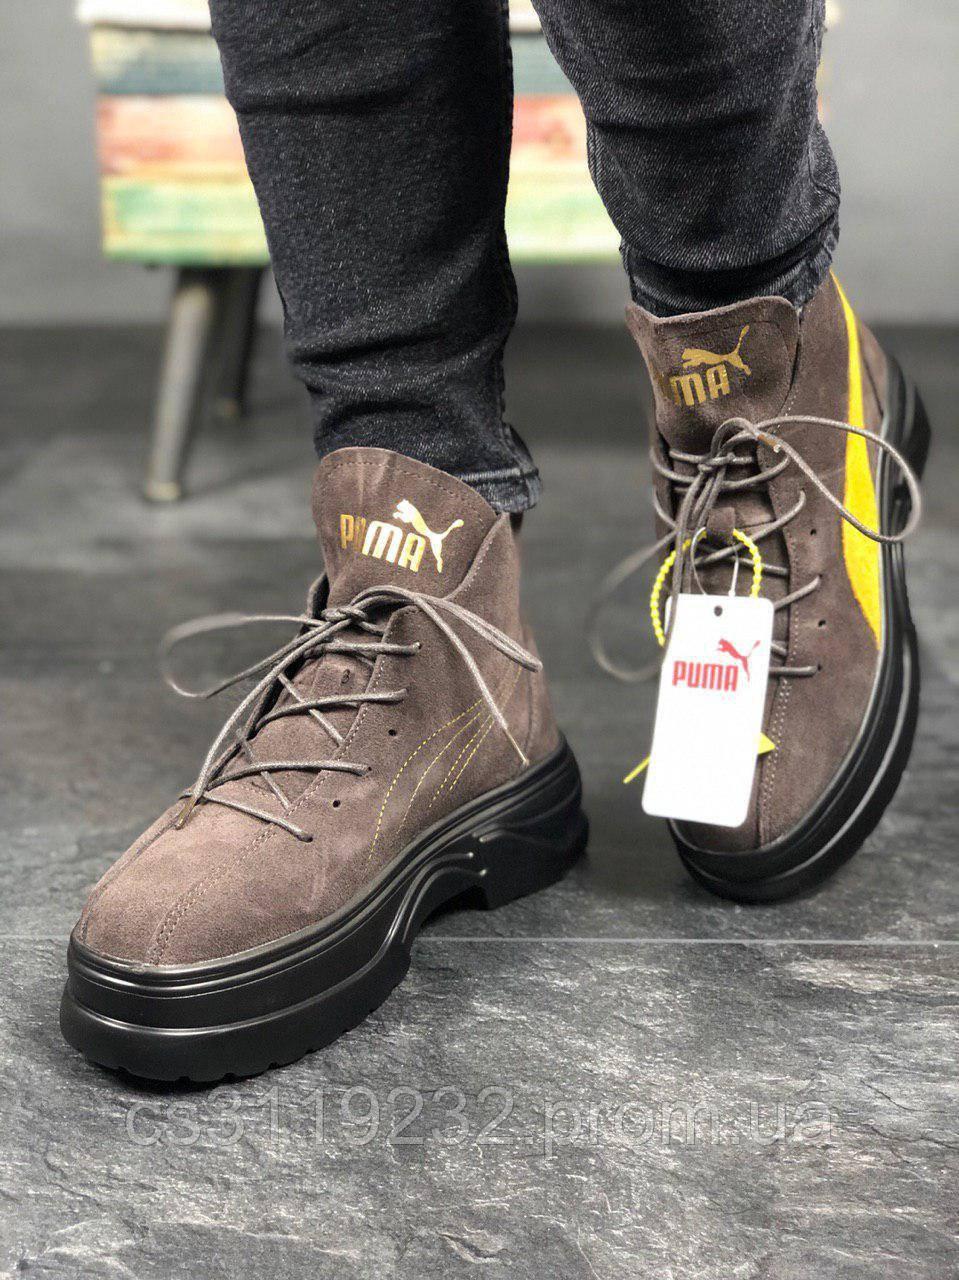 Женские ботинки Puma Spring Boots Brown Yellow Black (коричневые)